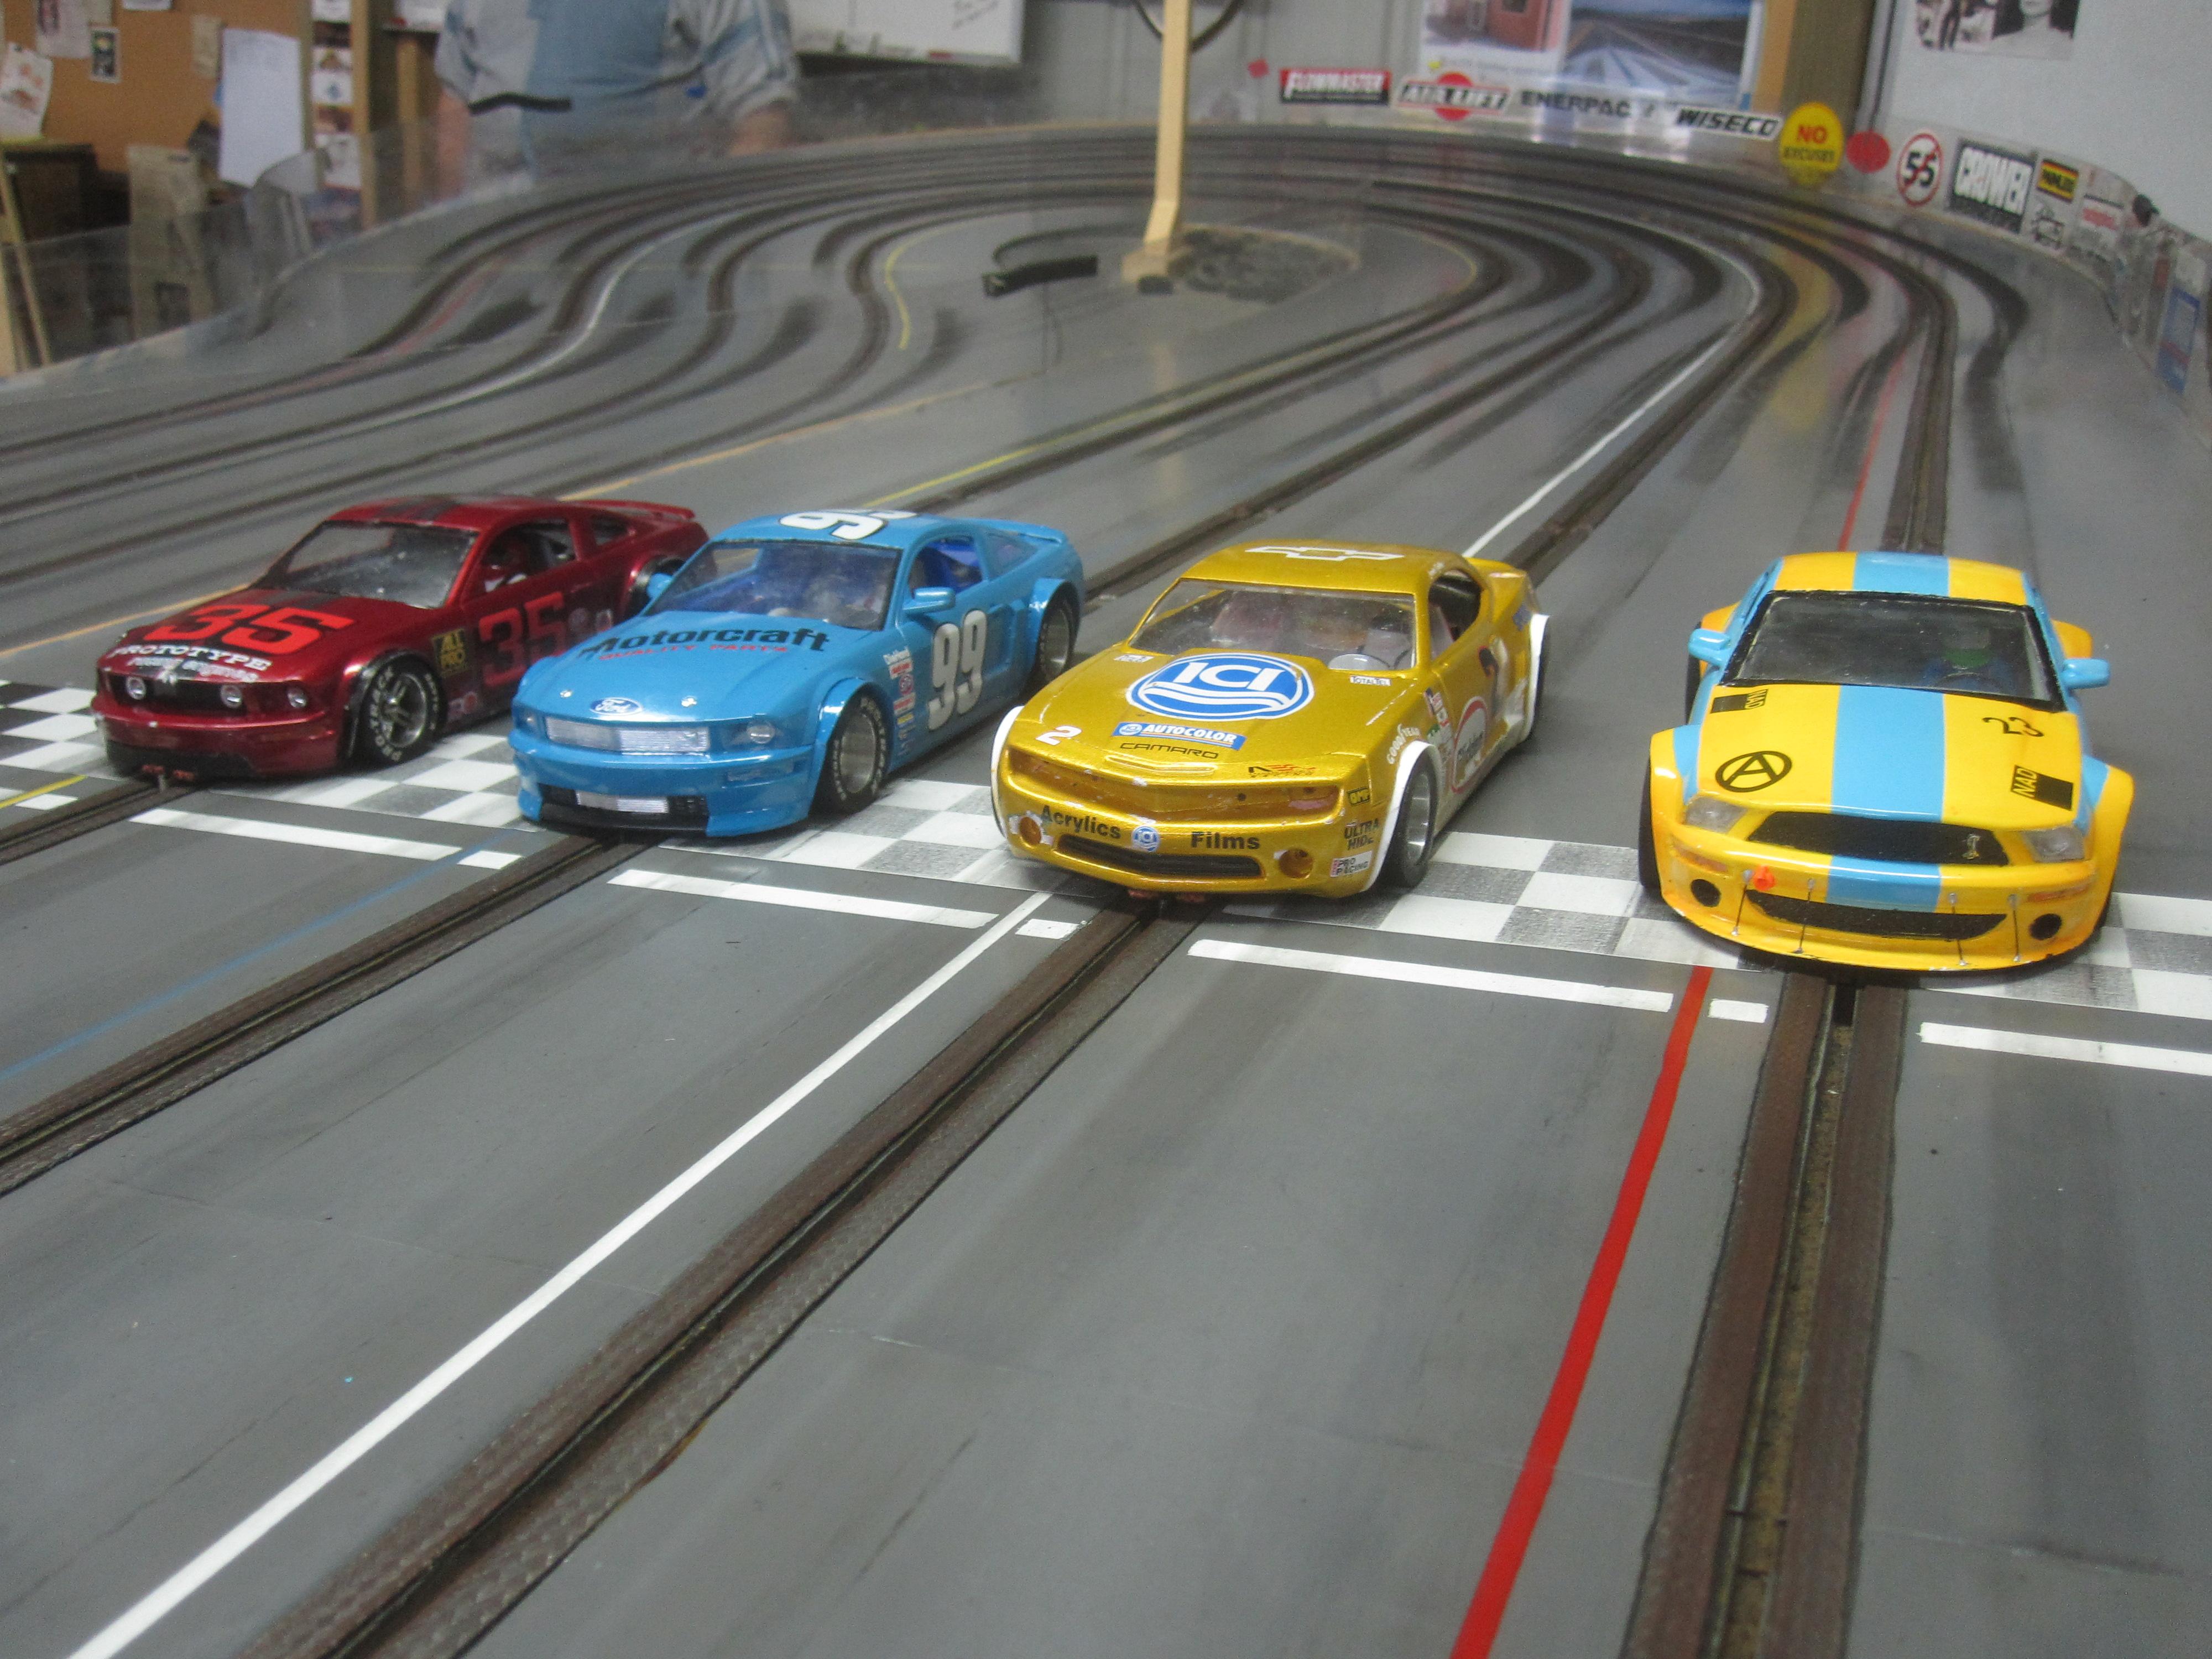 http://www.naste.org/members/bill/RaceResultsTA2r.jpg